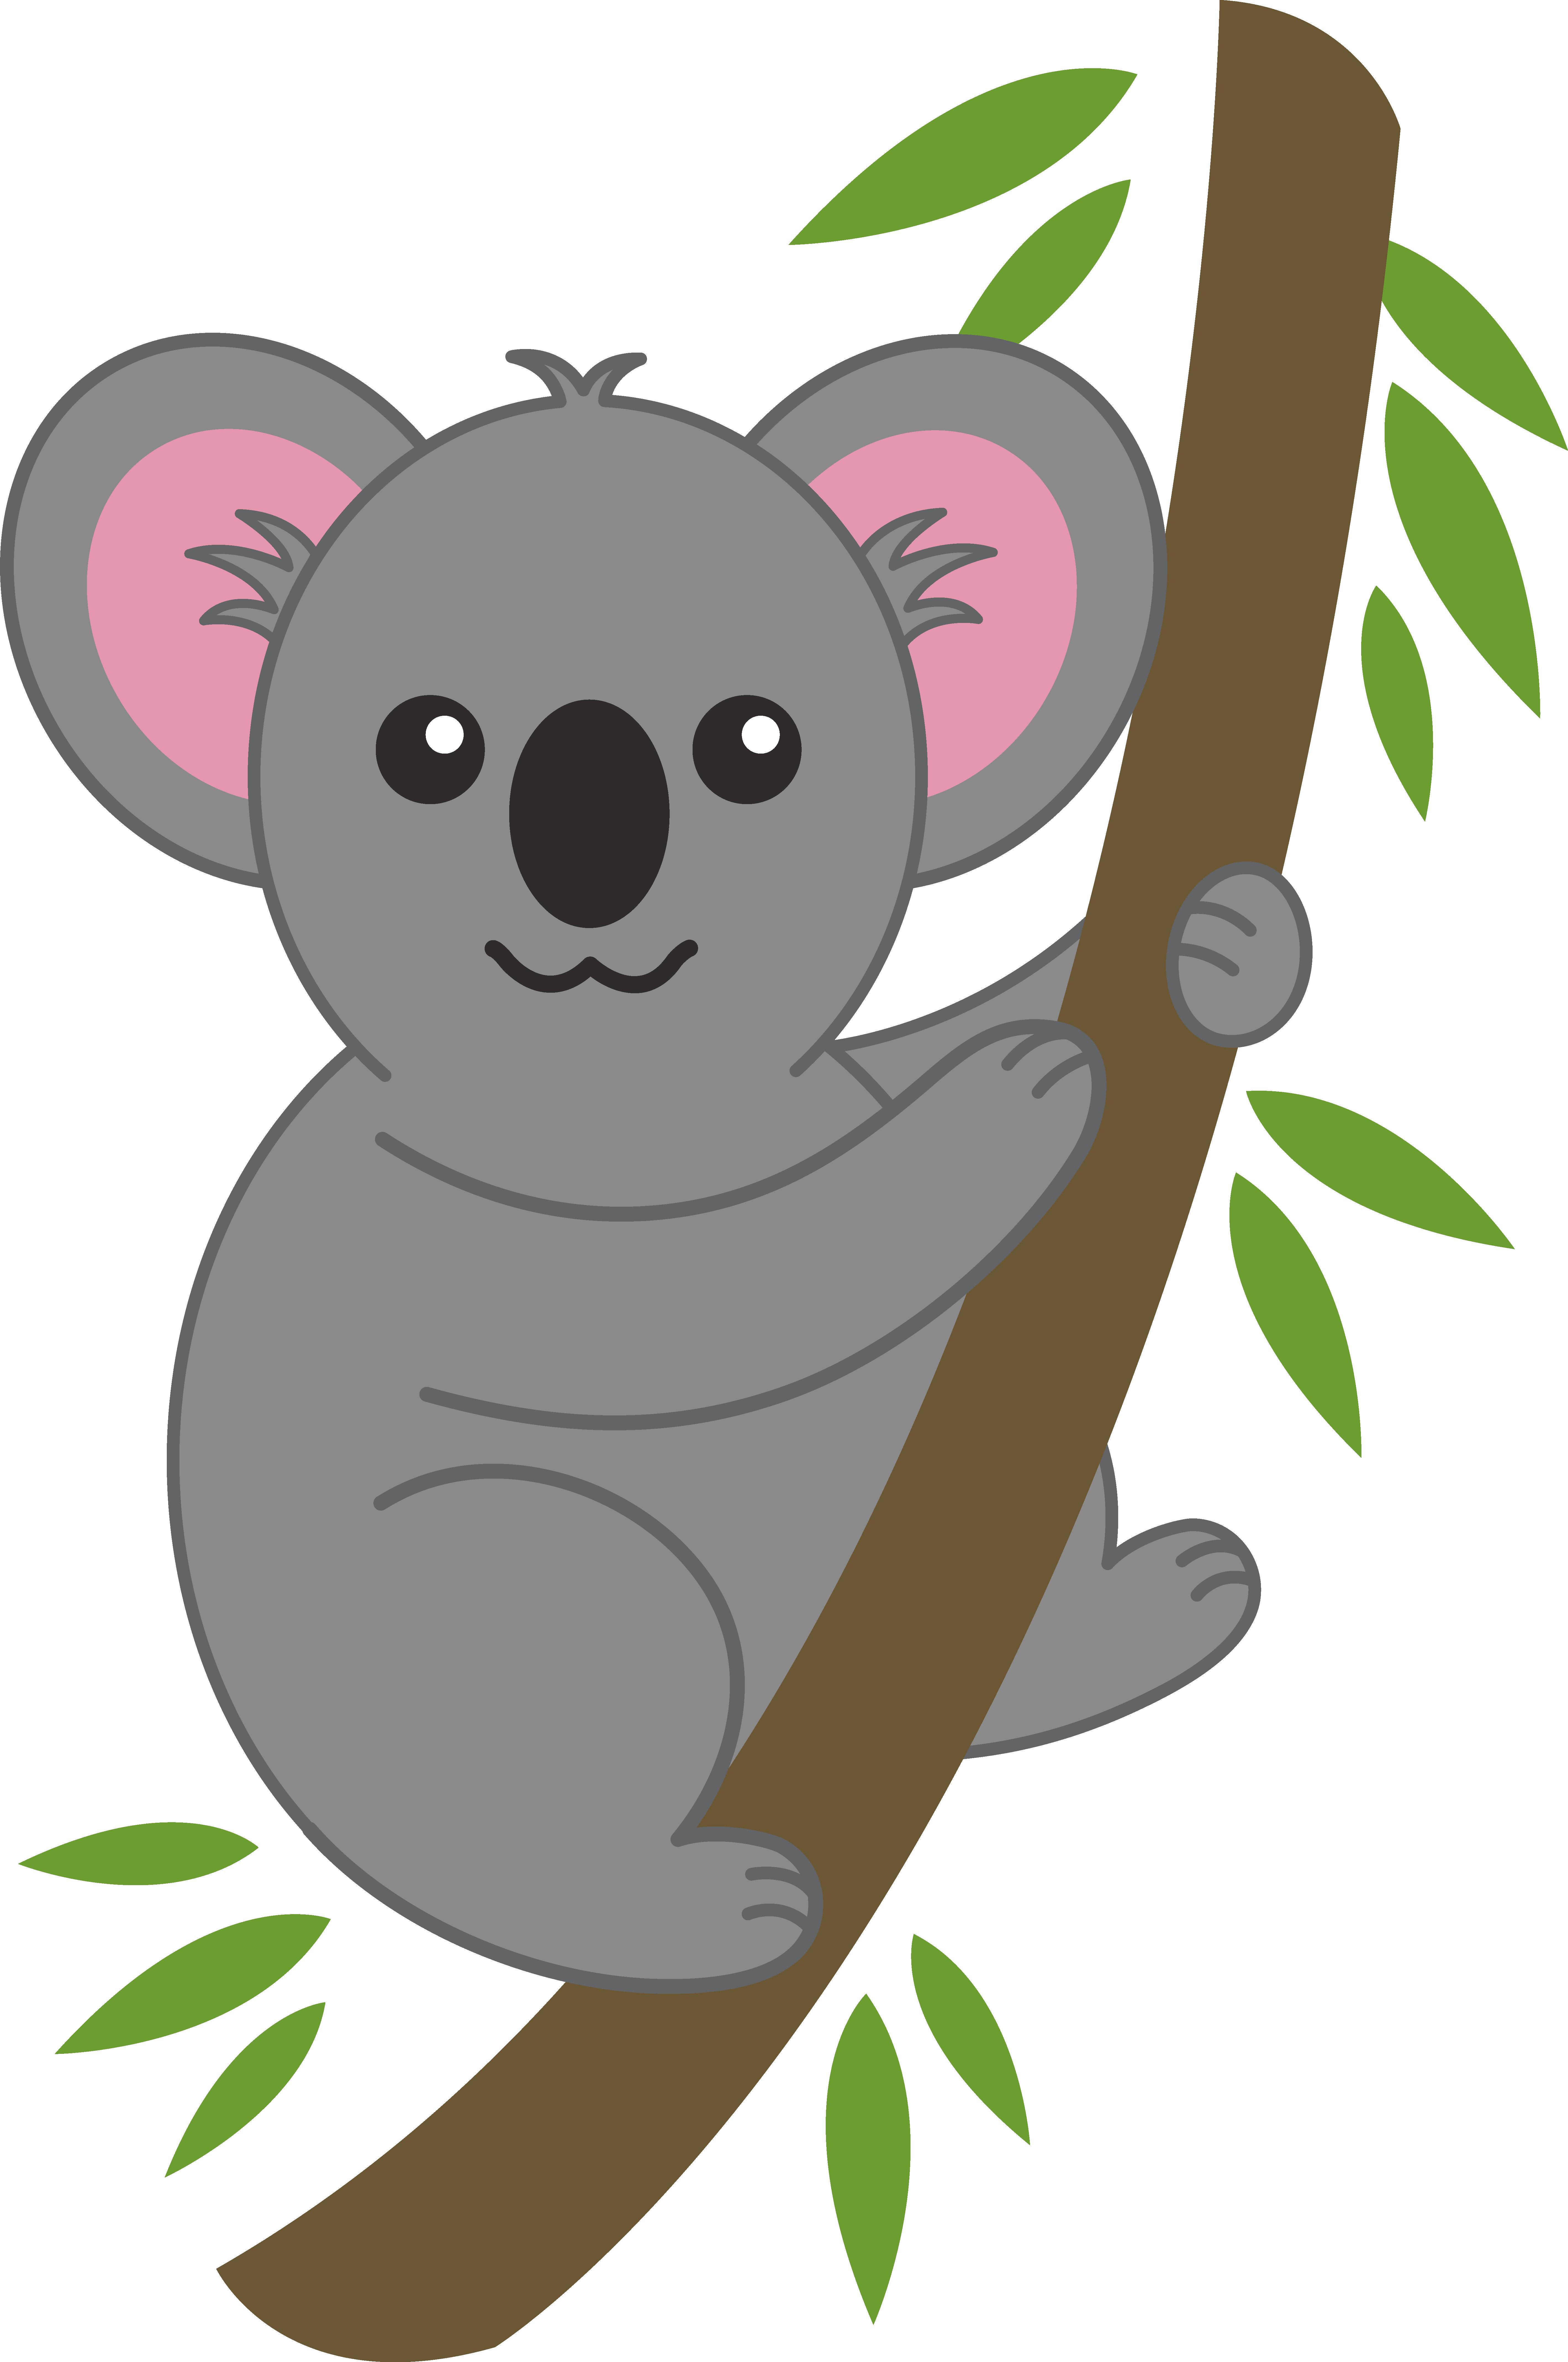 small resolution of koala bear clip art cute koala on tree branch free clip art